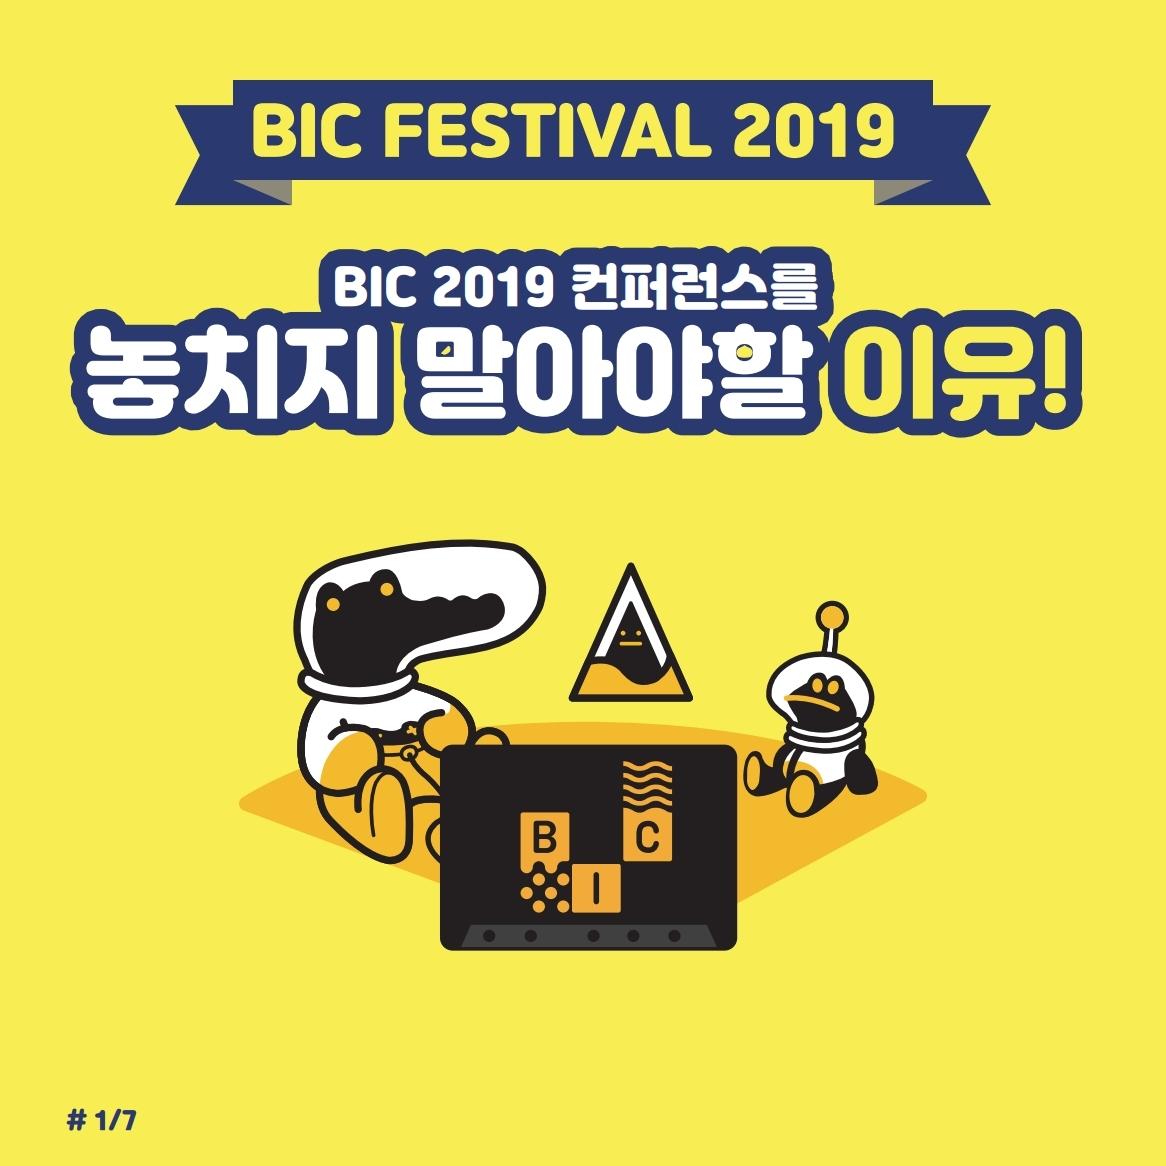 BIC_cardnews_01_Conference_01.jpg